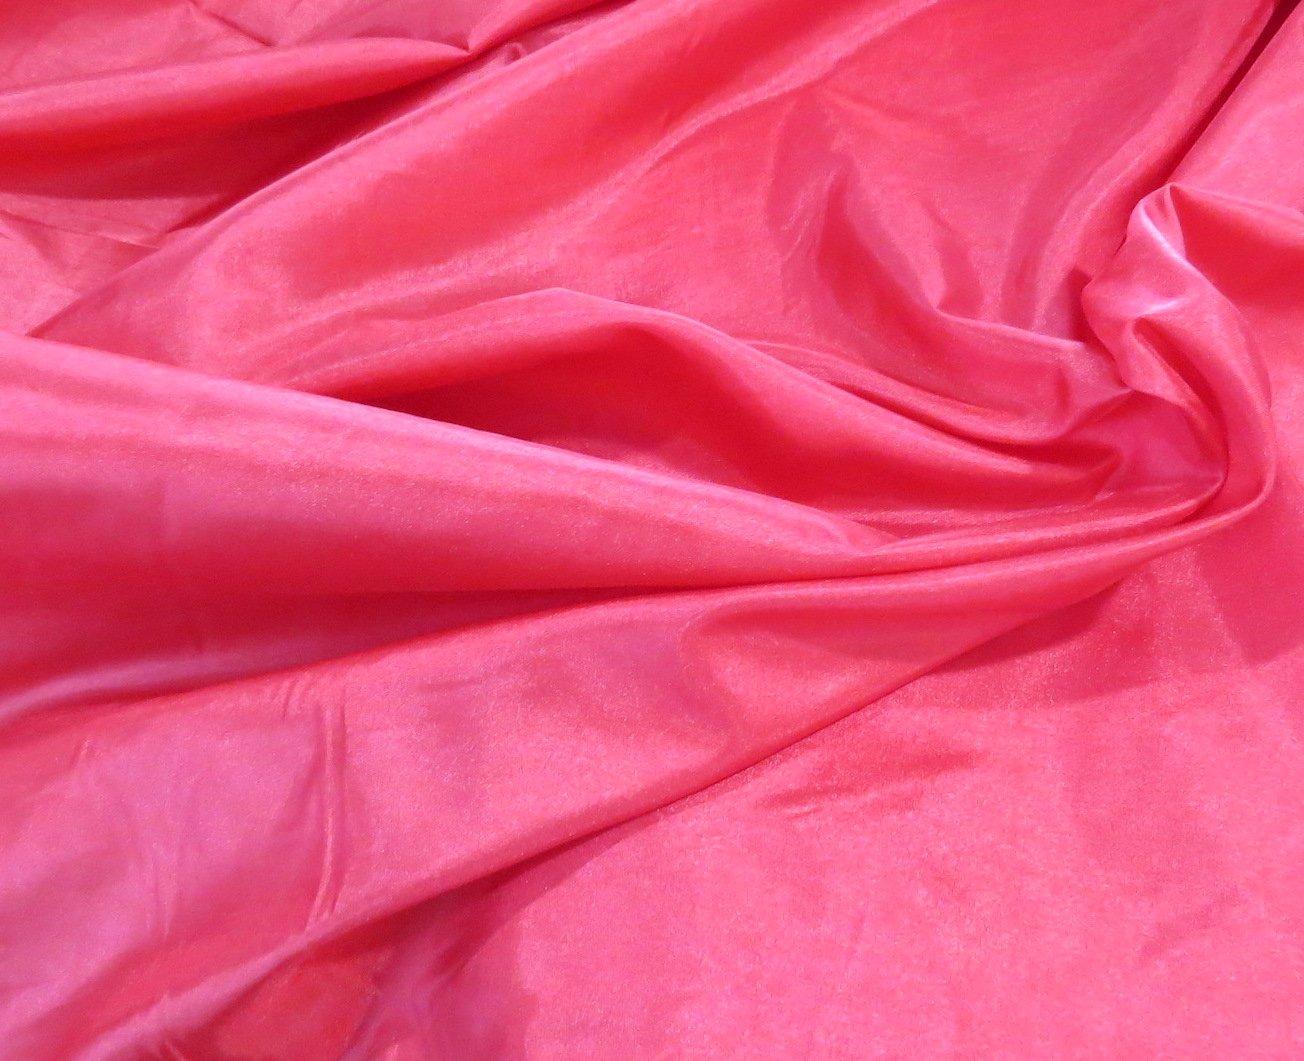 Red China Silk Lining